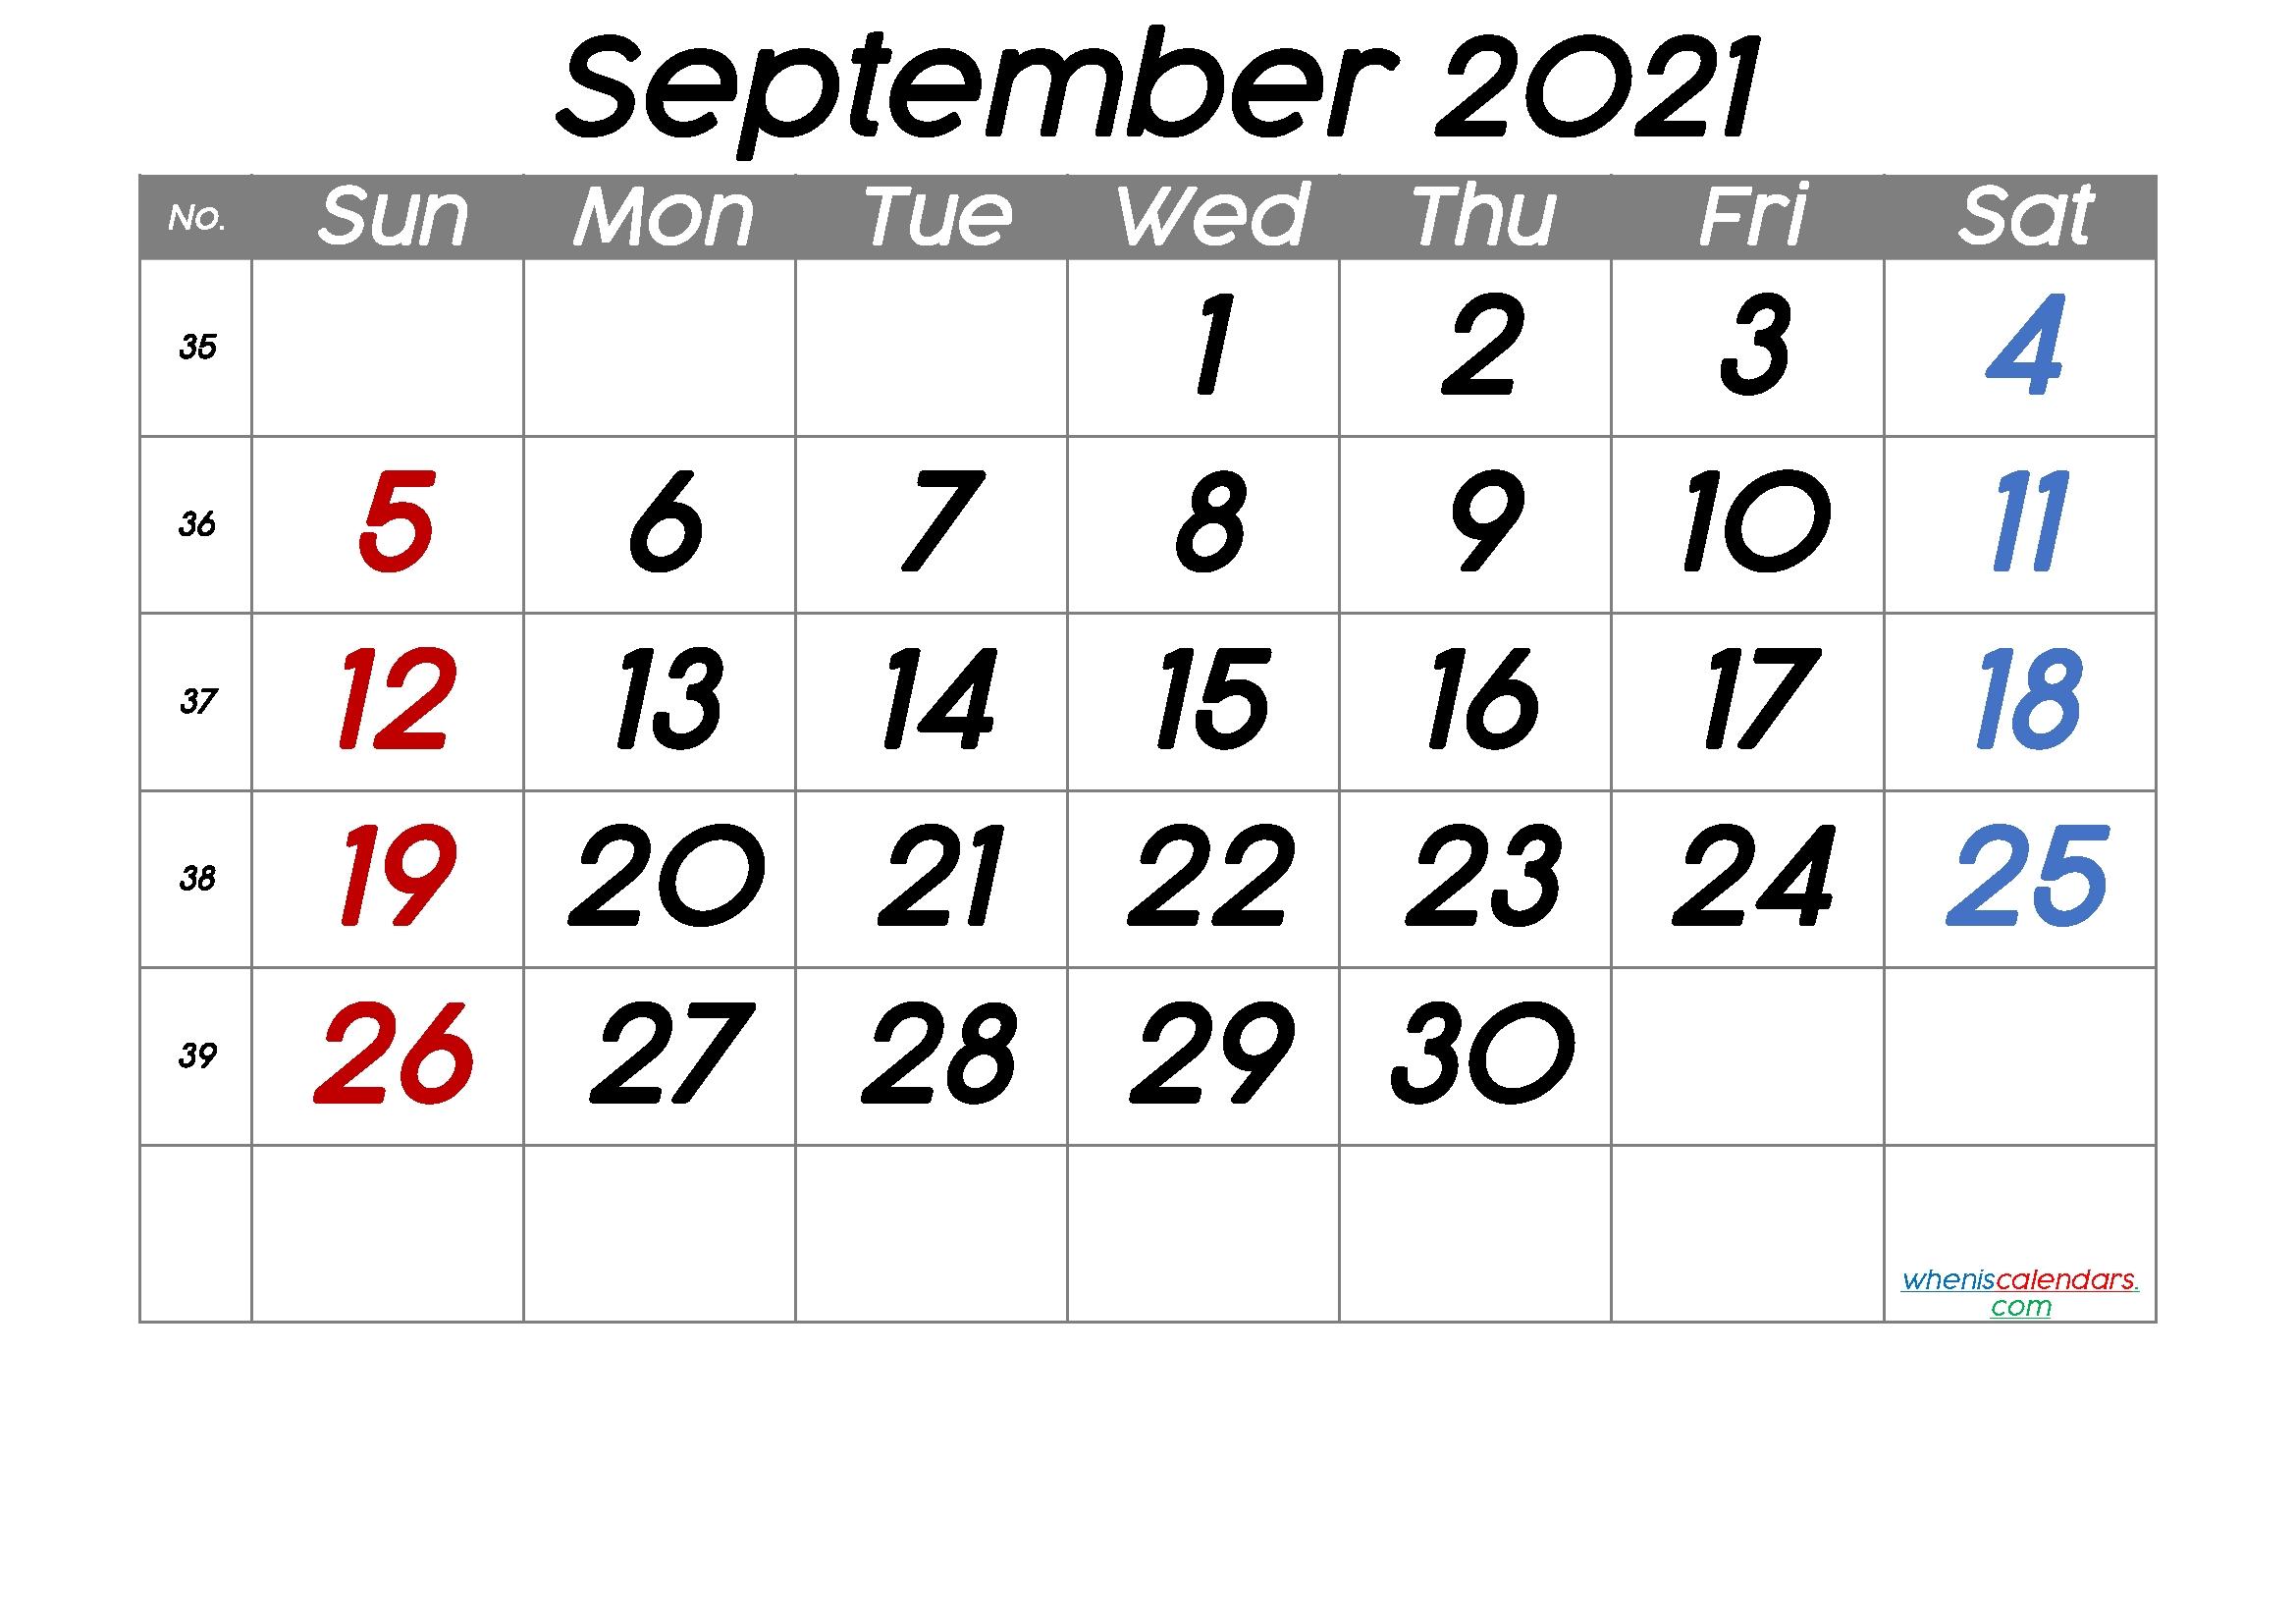 Free Printable September 2021 Calendar (Premium) September 2021 Calendar Pdf